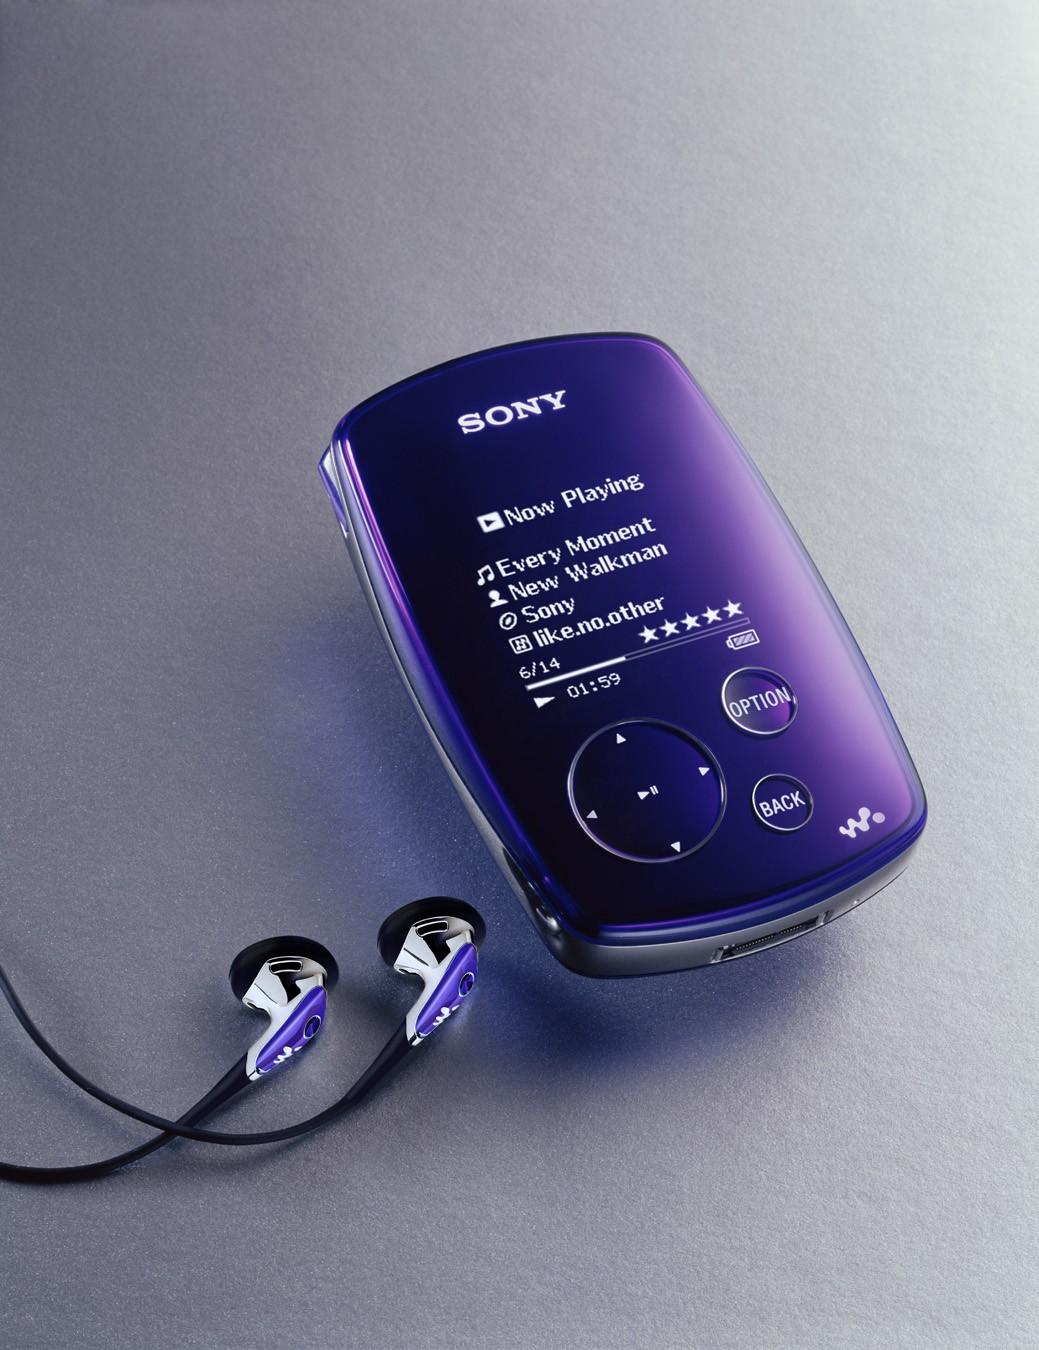 Mp3: Multimedia Software Sony Walkman NW-S200, Mp3 Player